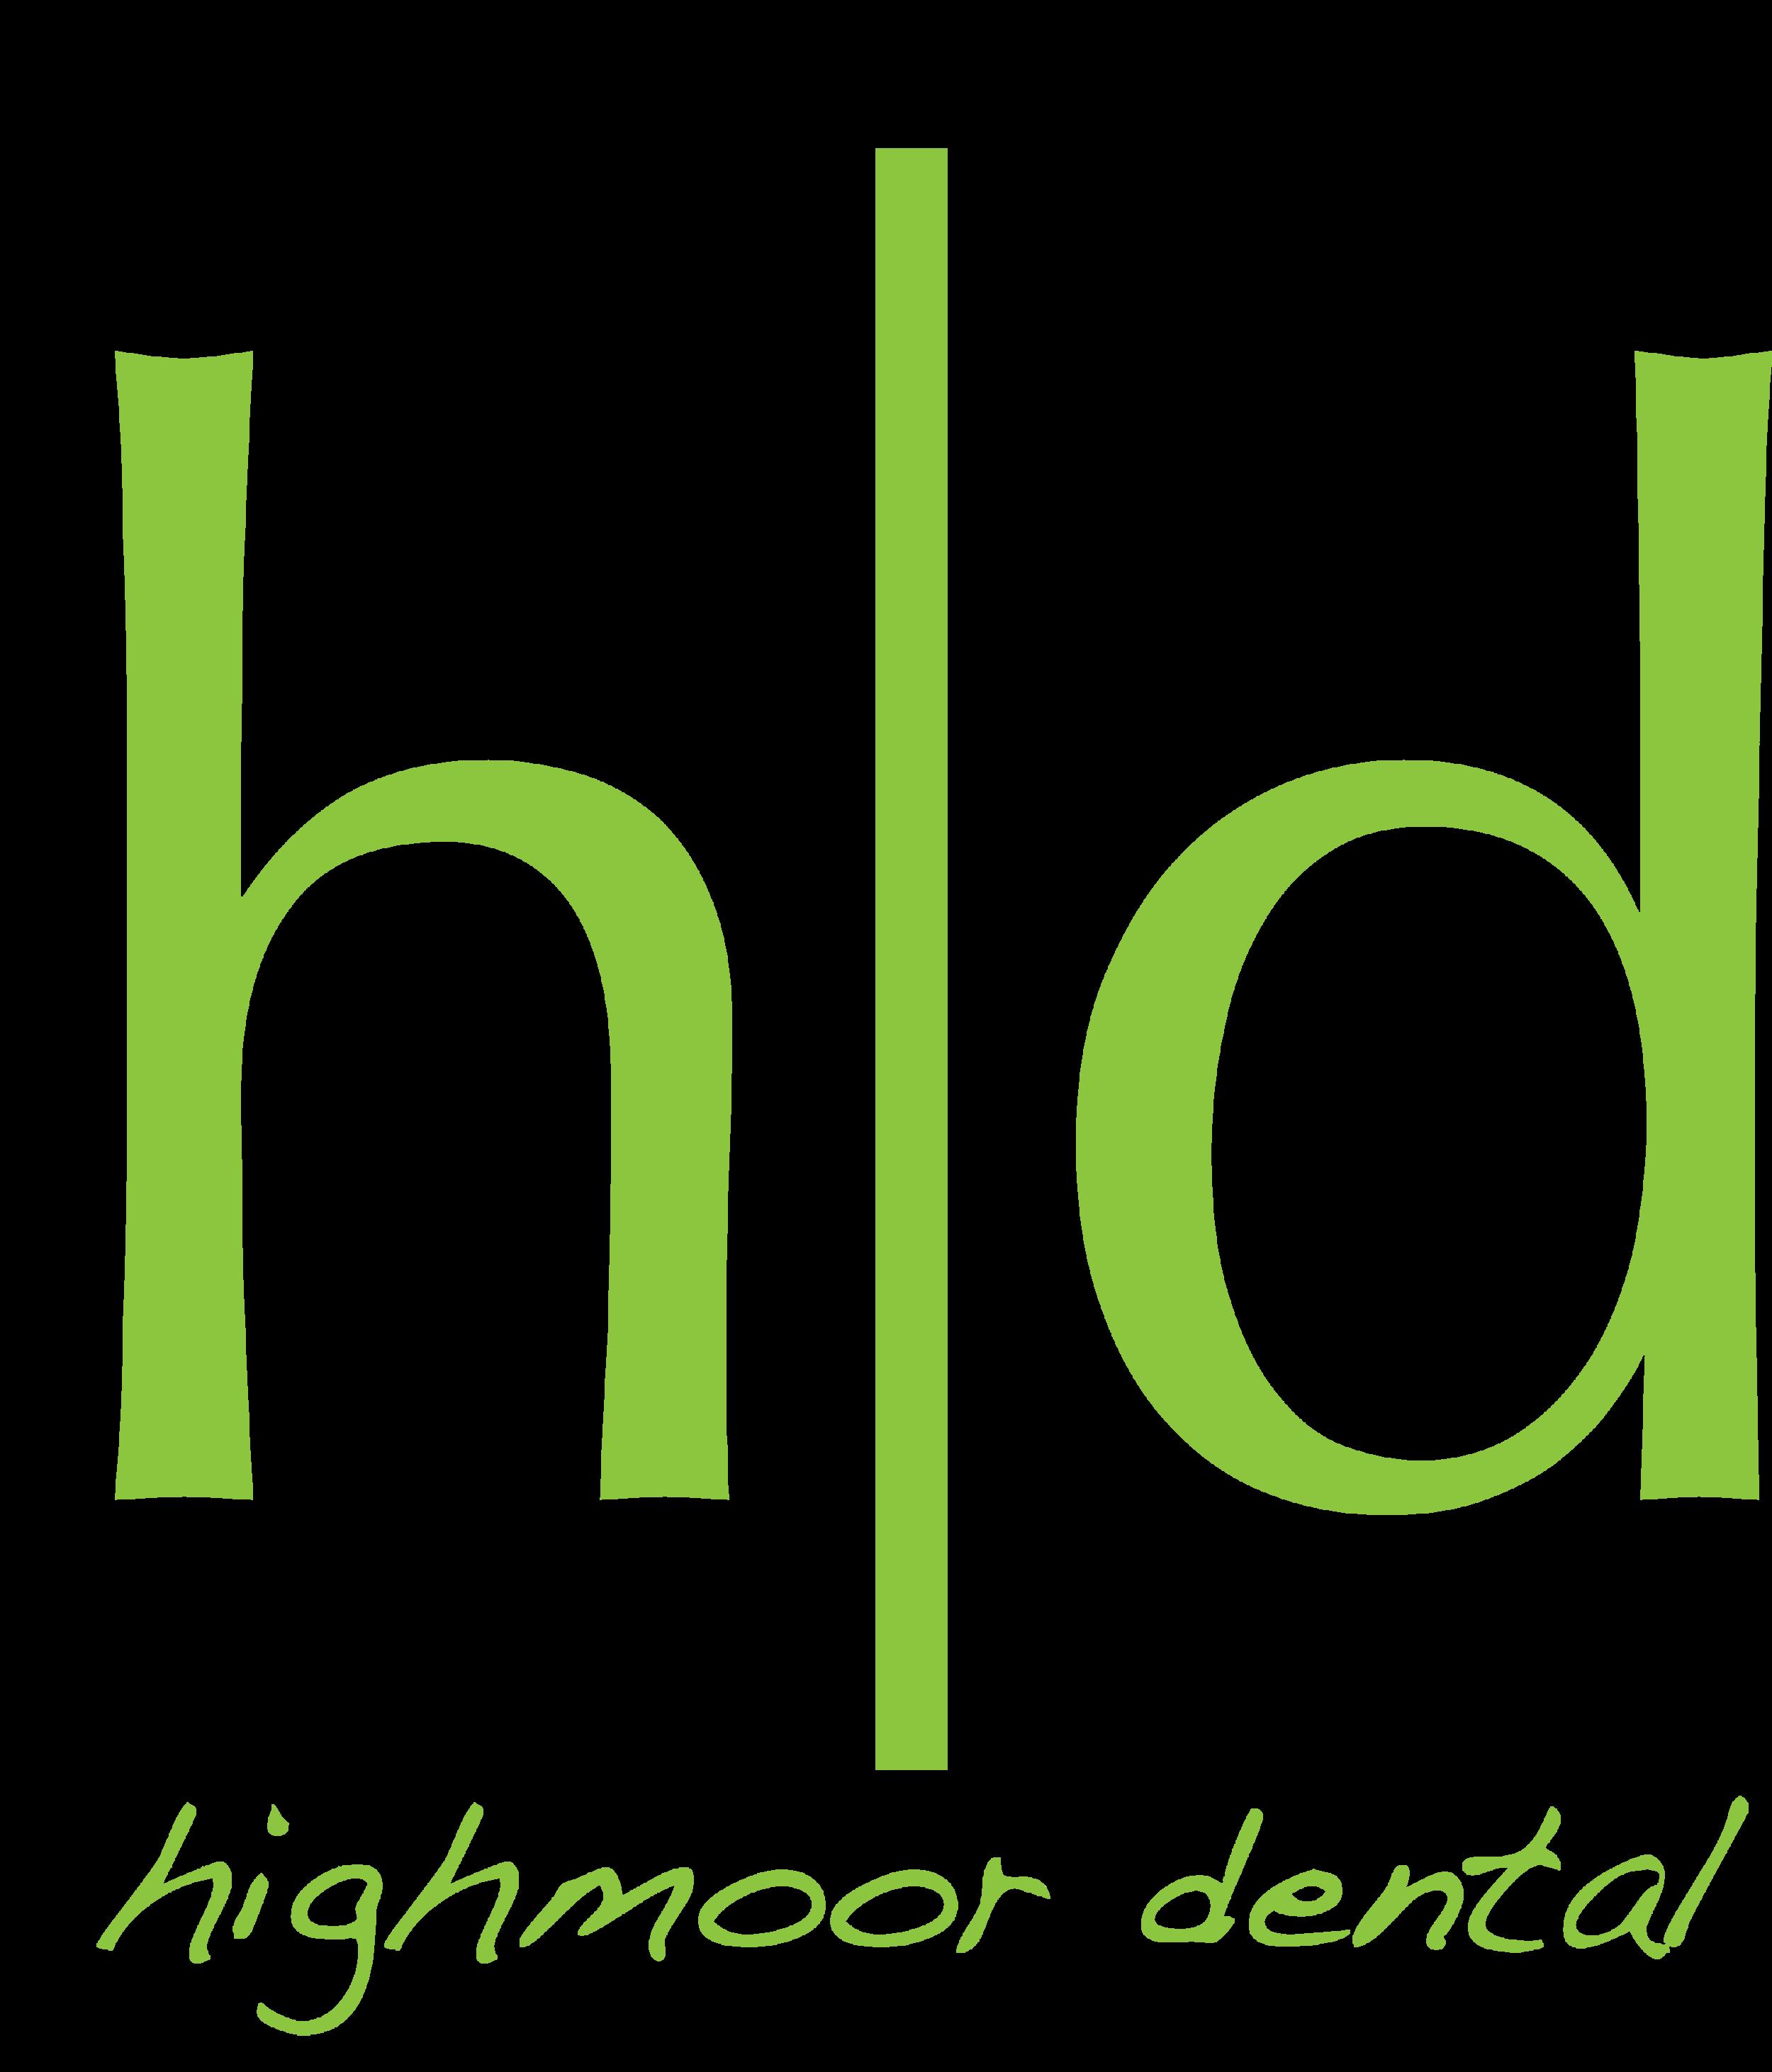 Highmoor-Dental-Downtown-Edmonton-Dentist-Logo-WhiteBG.png